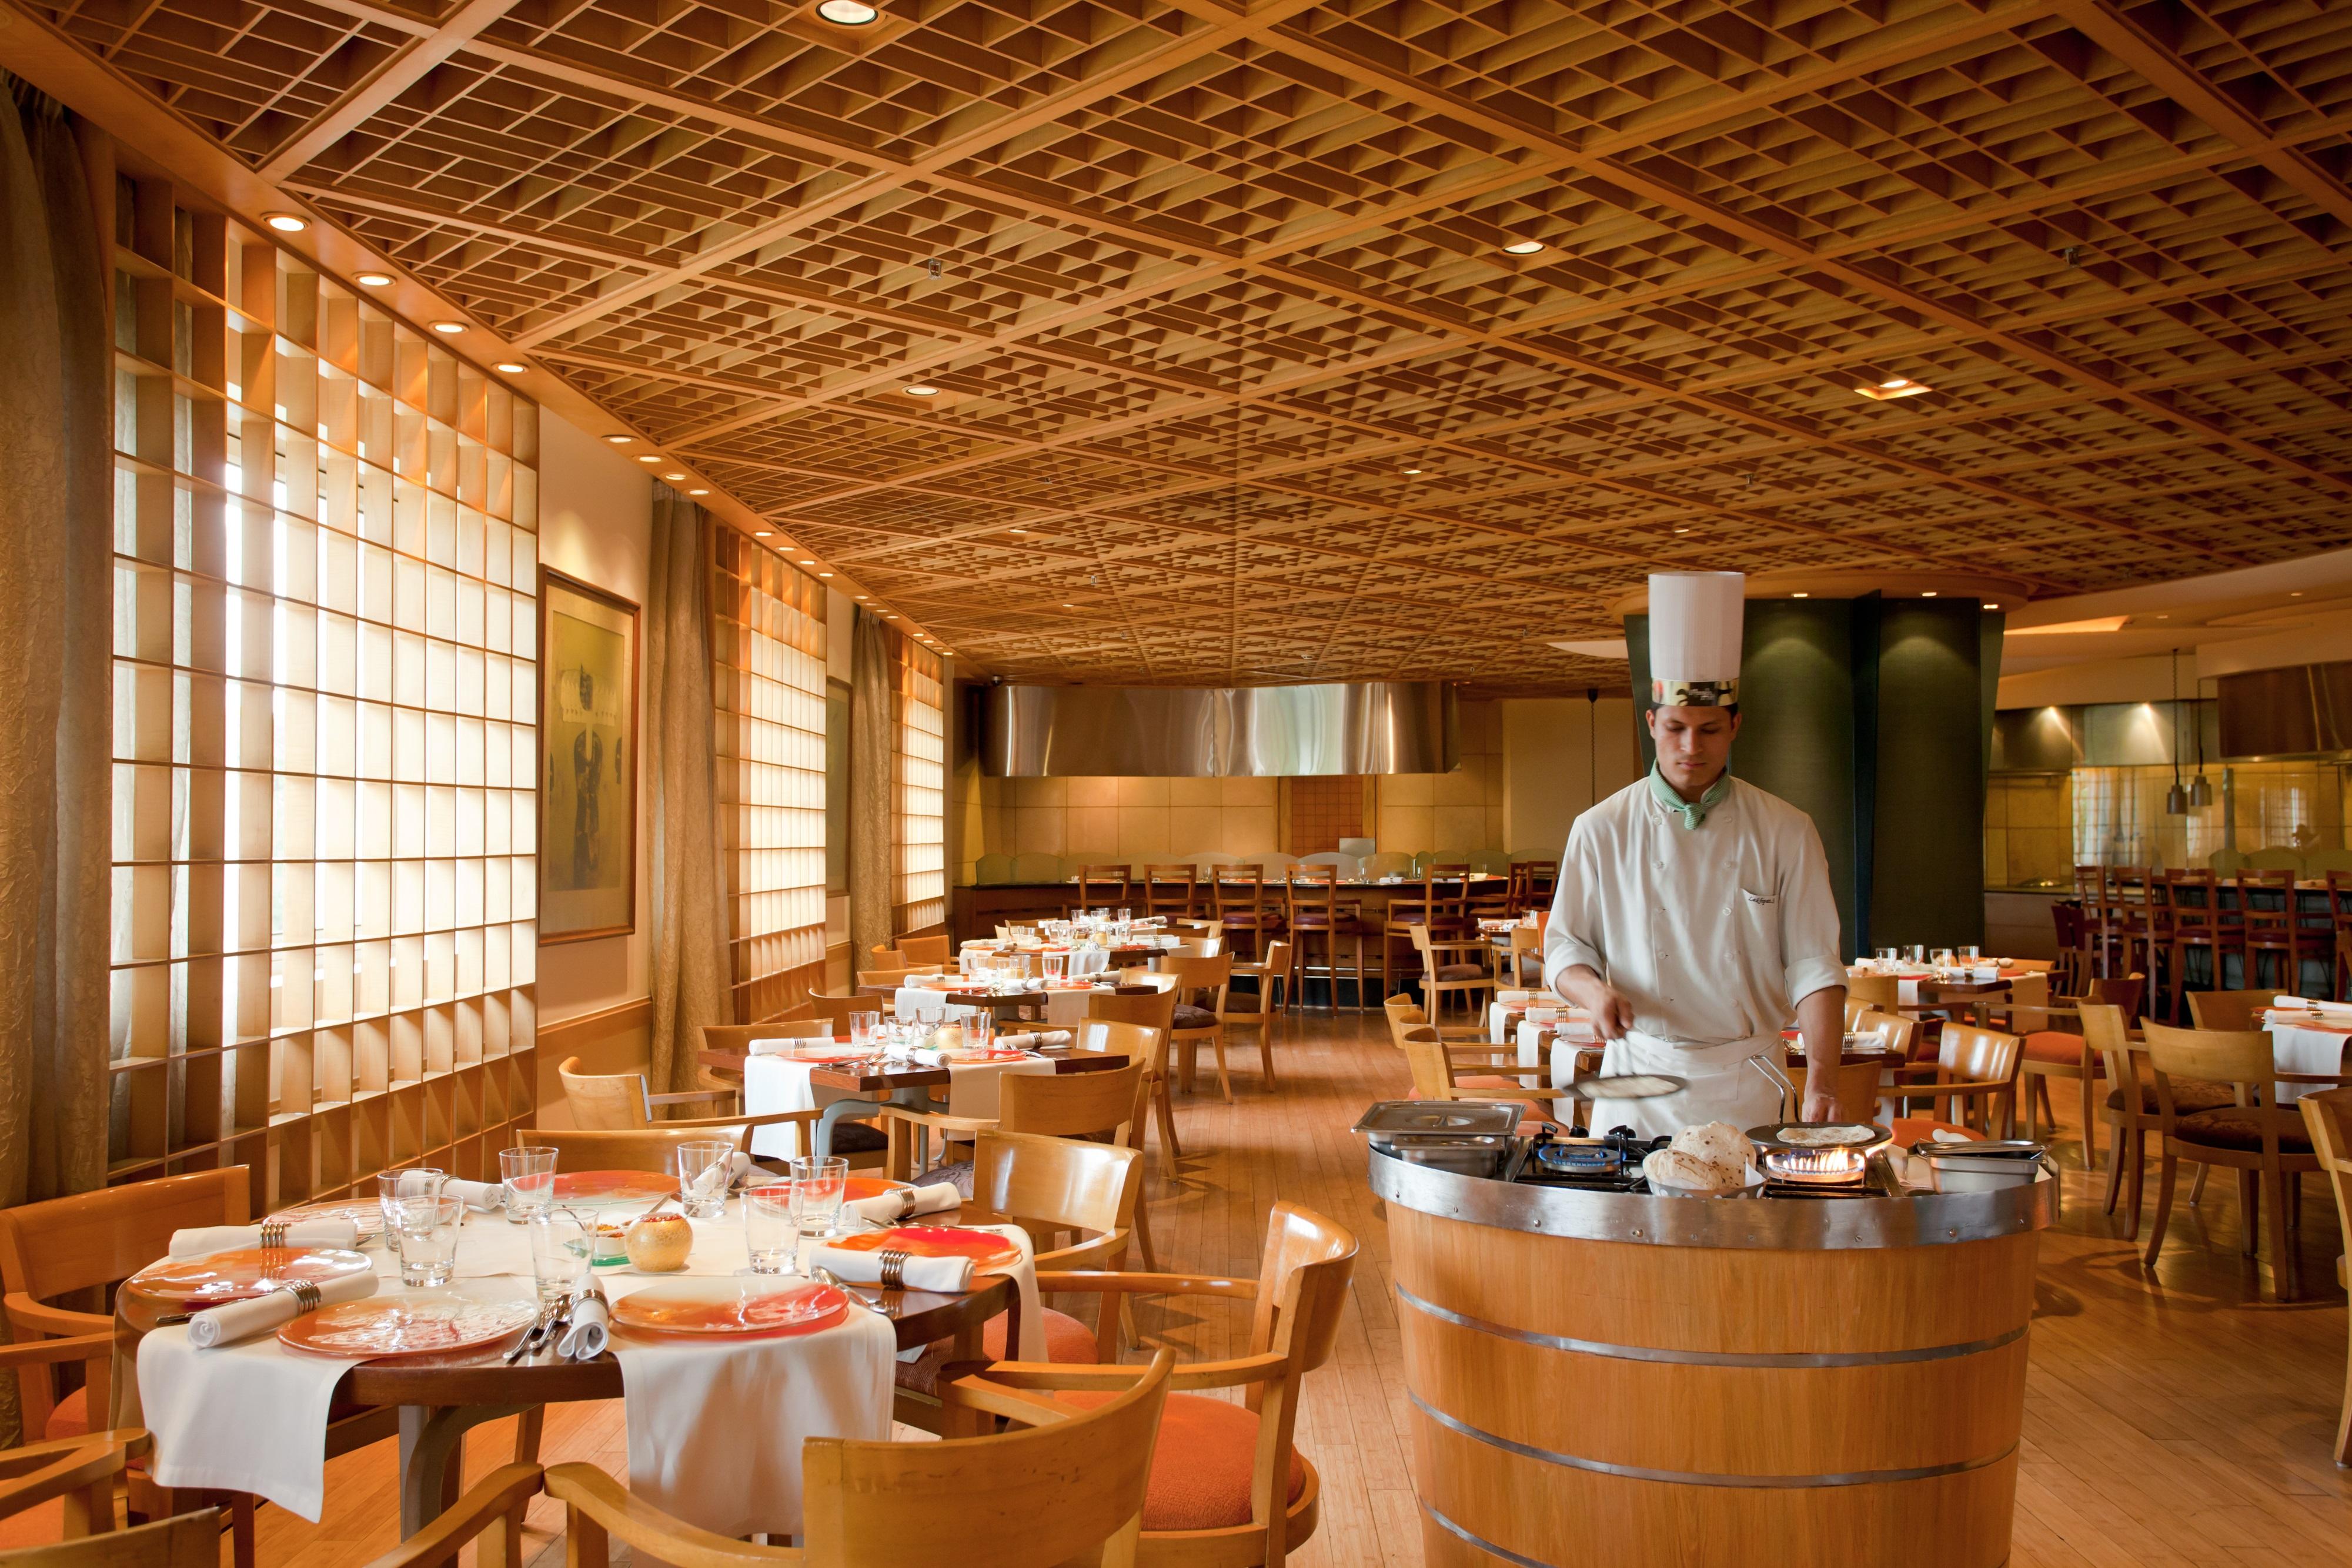 Masala Art - North Indian Cuisine Restaurant at Taj Palace, New Delhi